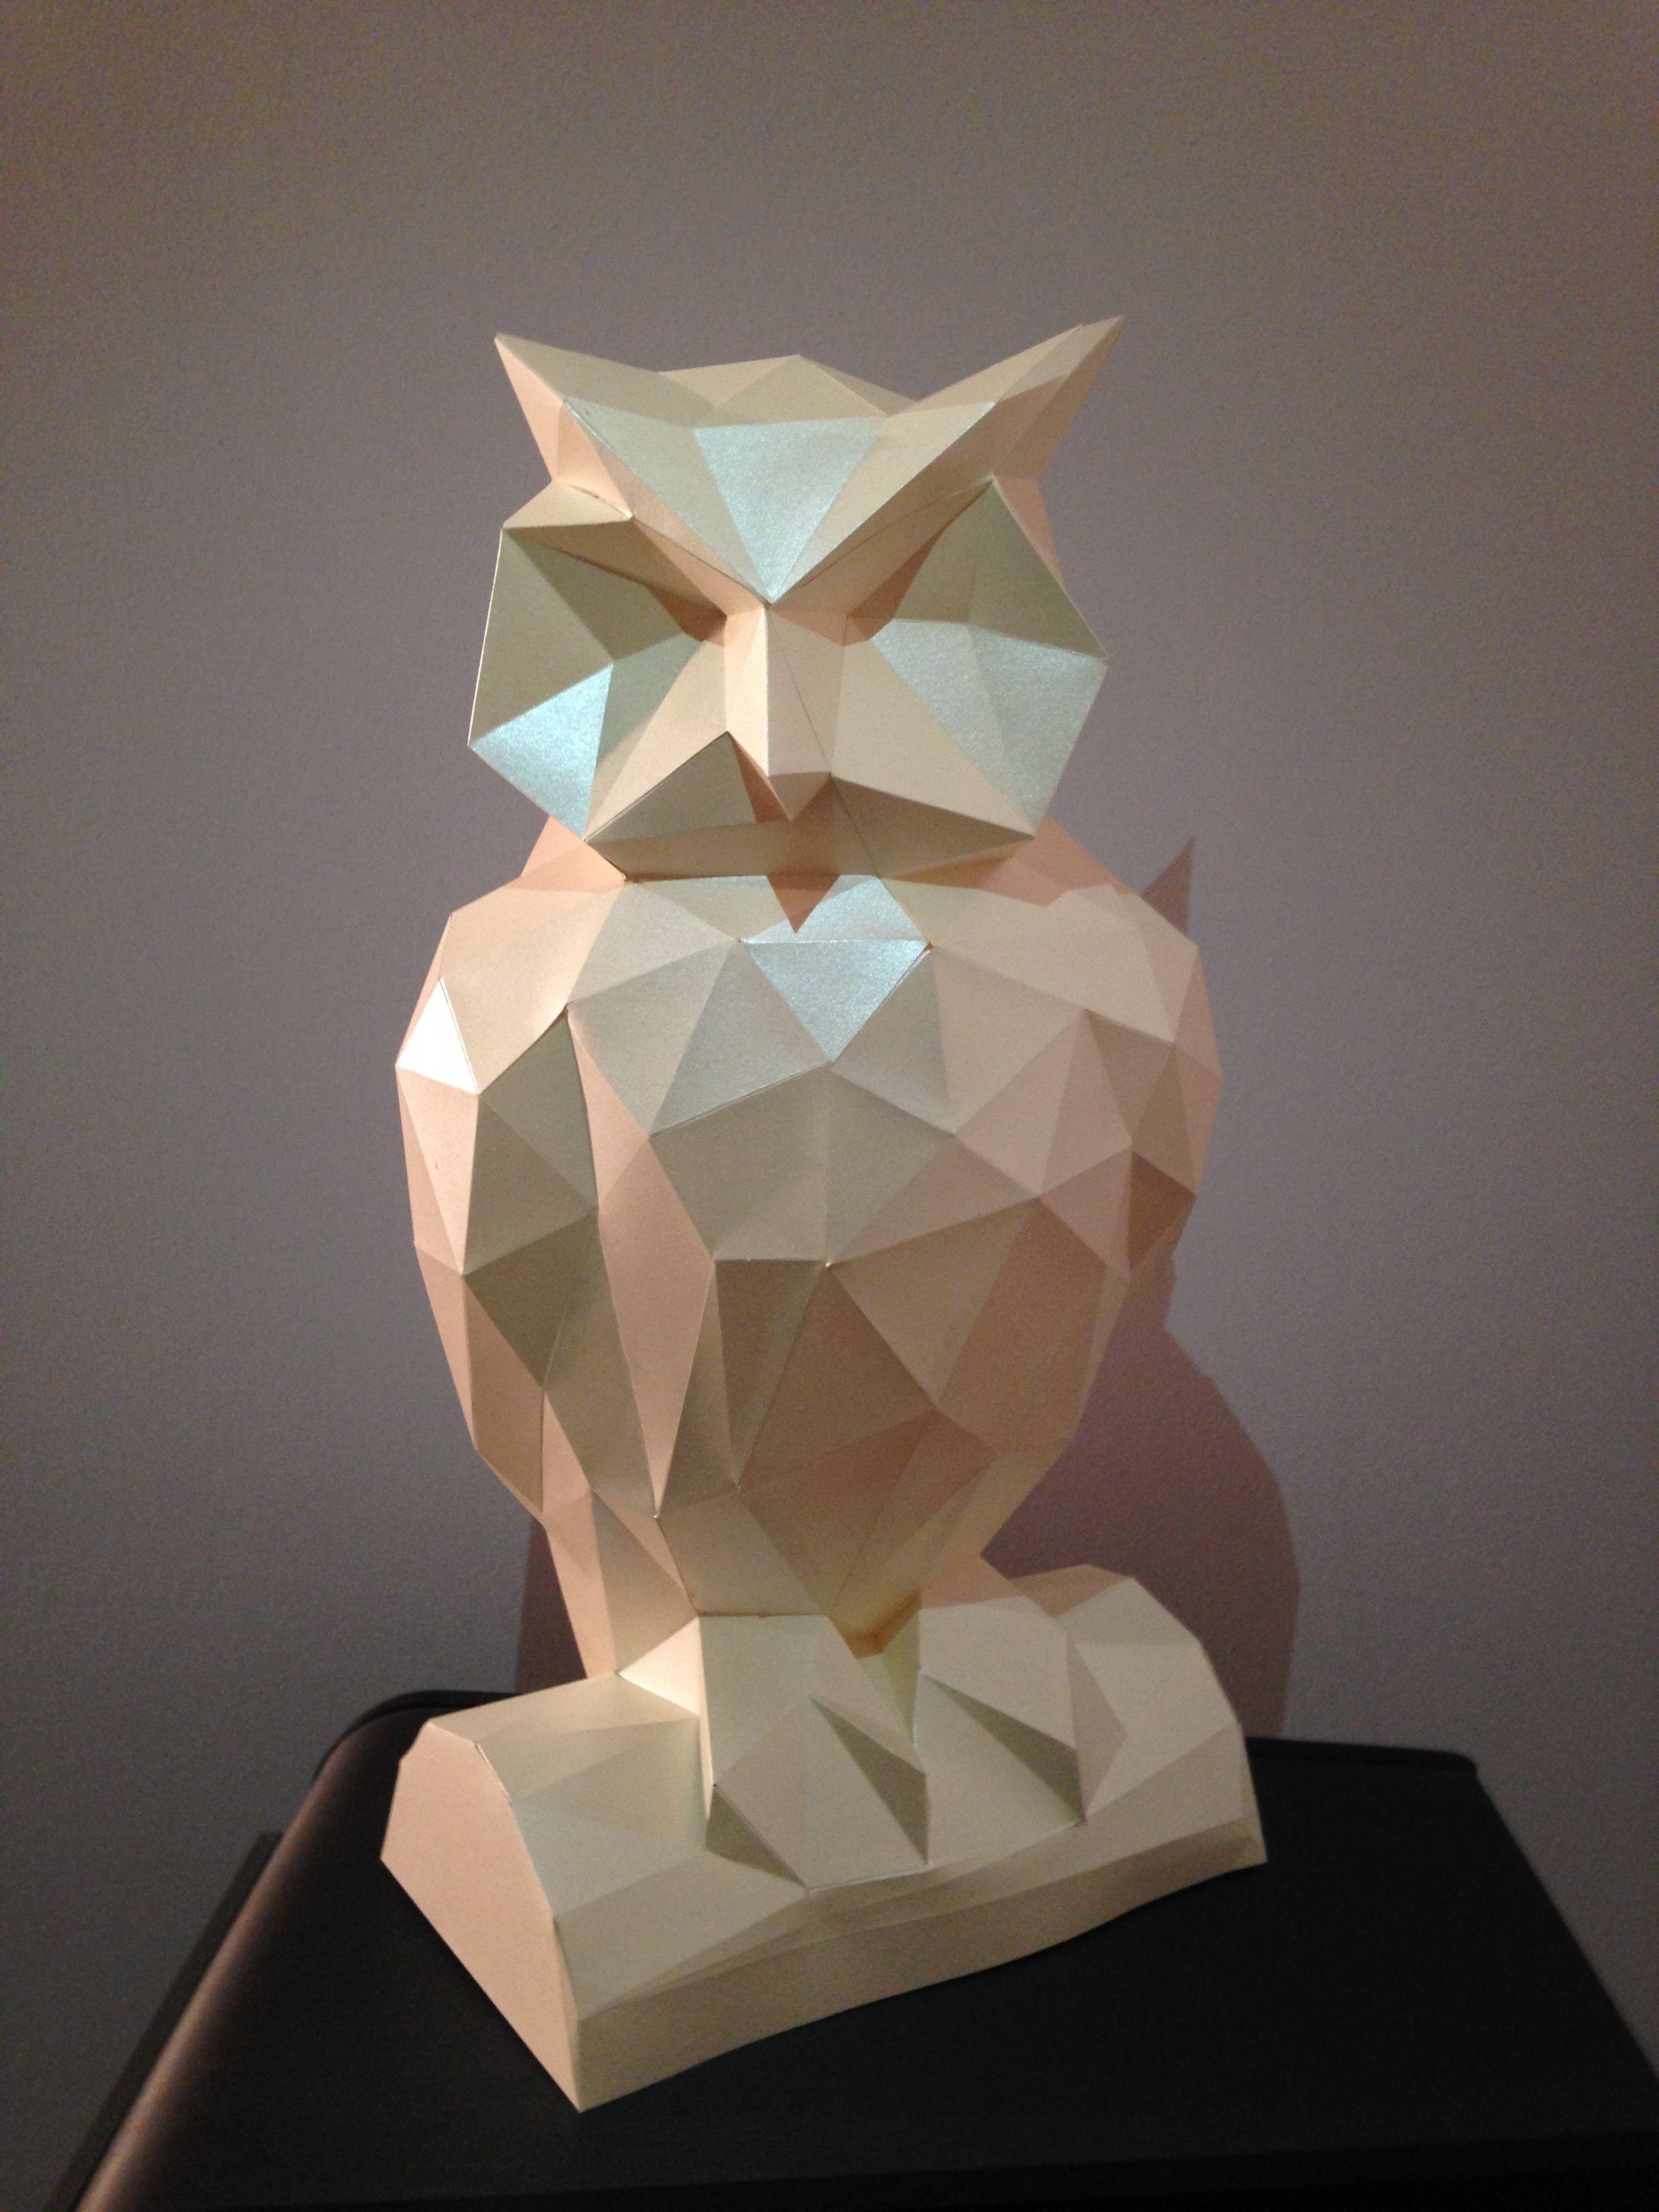 Lion Papercraft Lespapiersenchantes Owl origami Papercraft